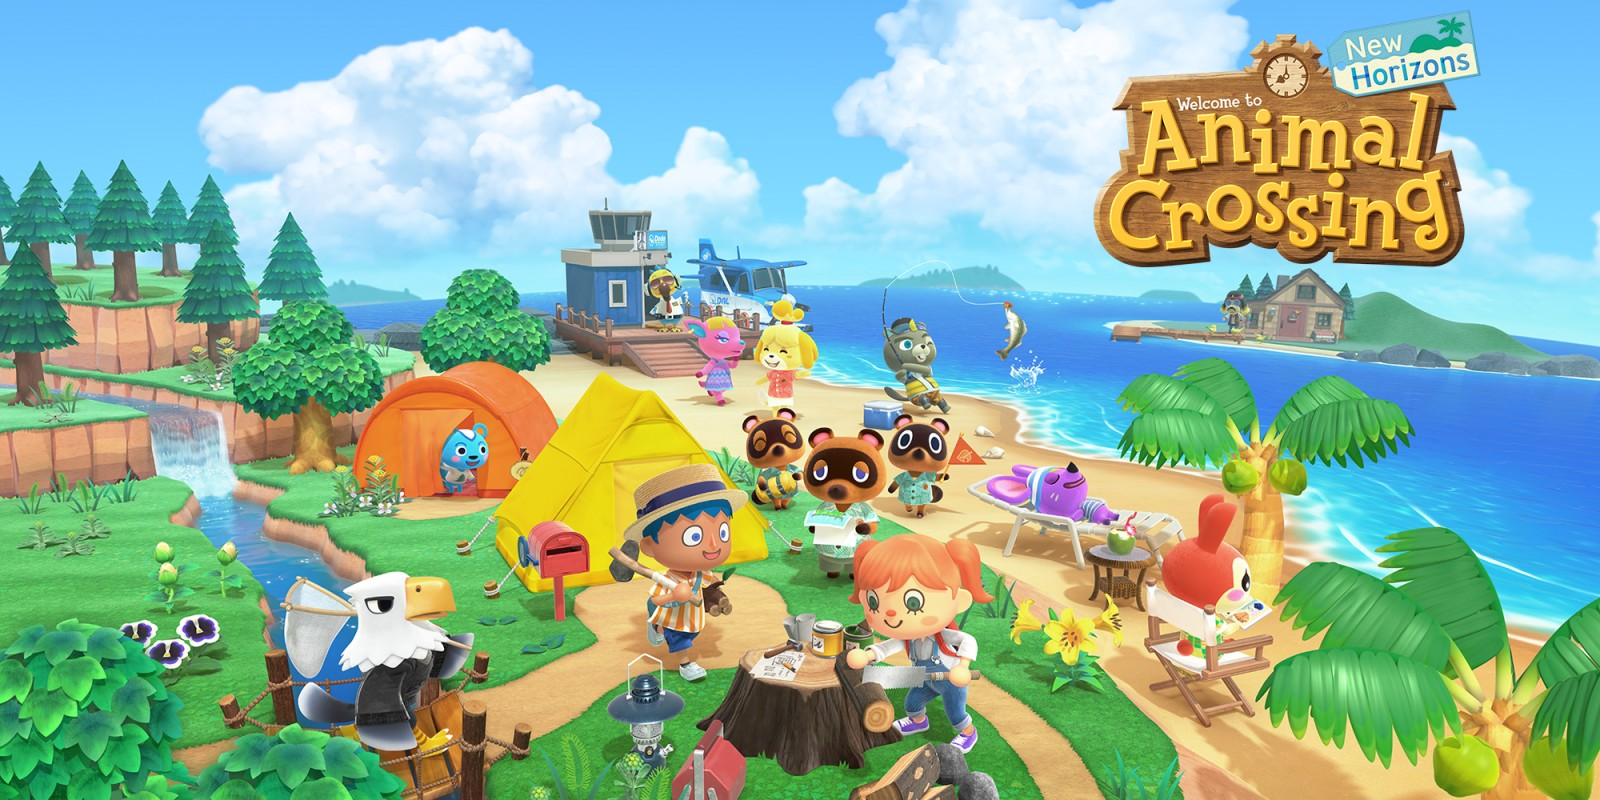 Animal Crossing: New Horizons Nintendo Switch Review